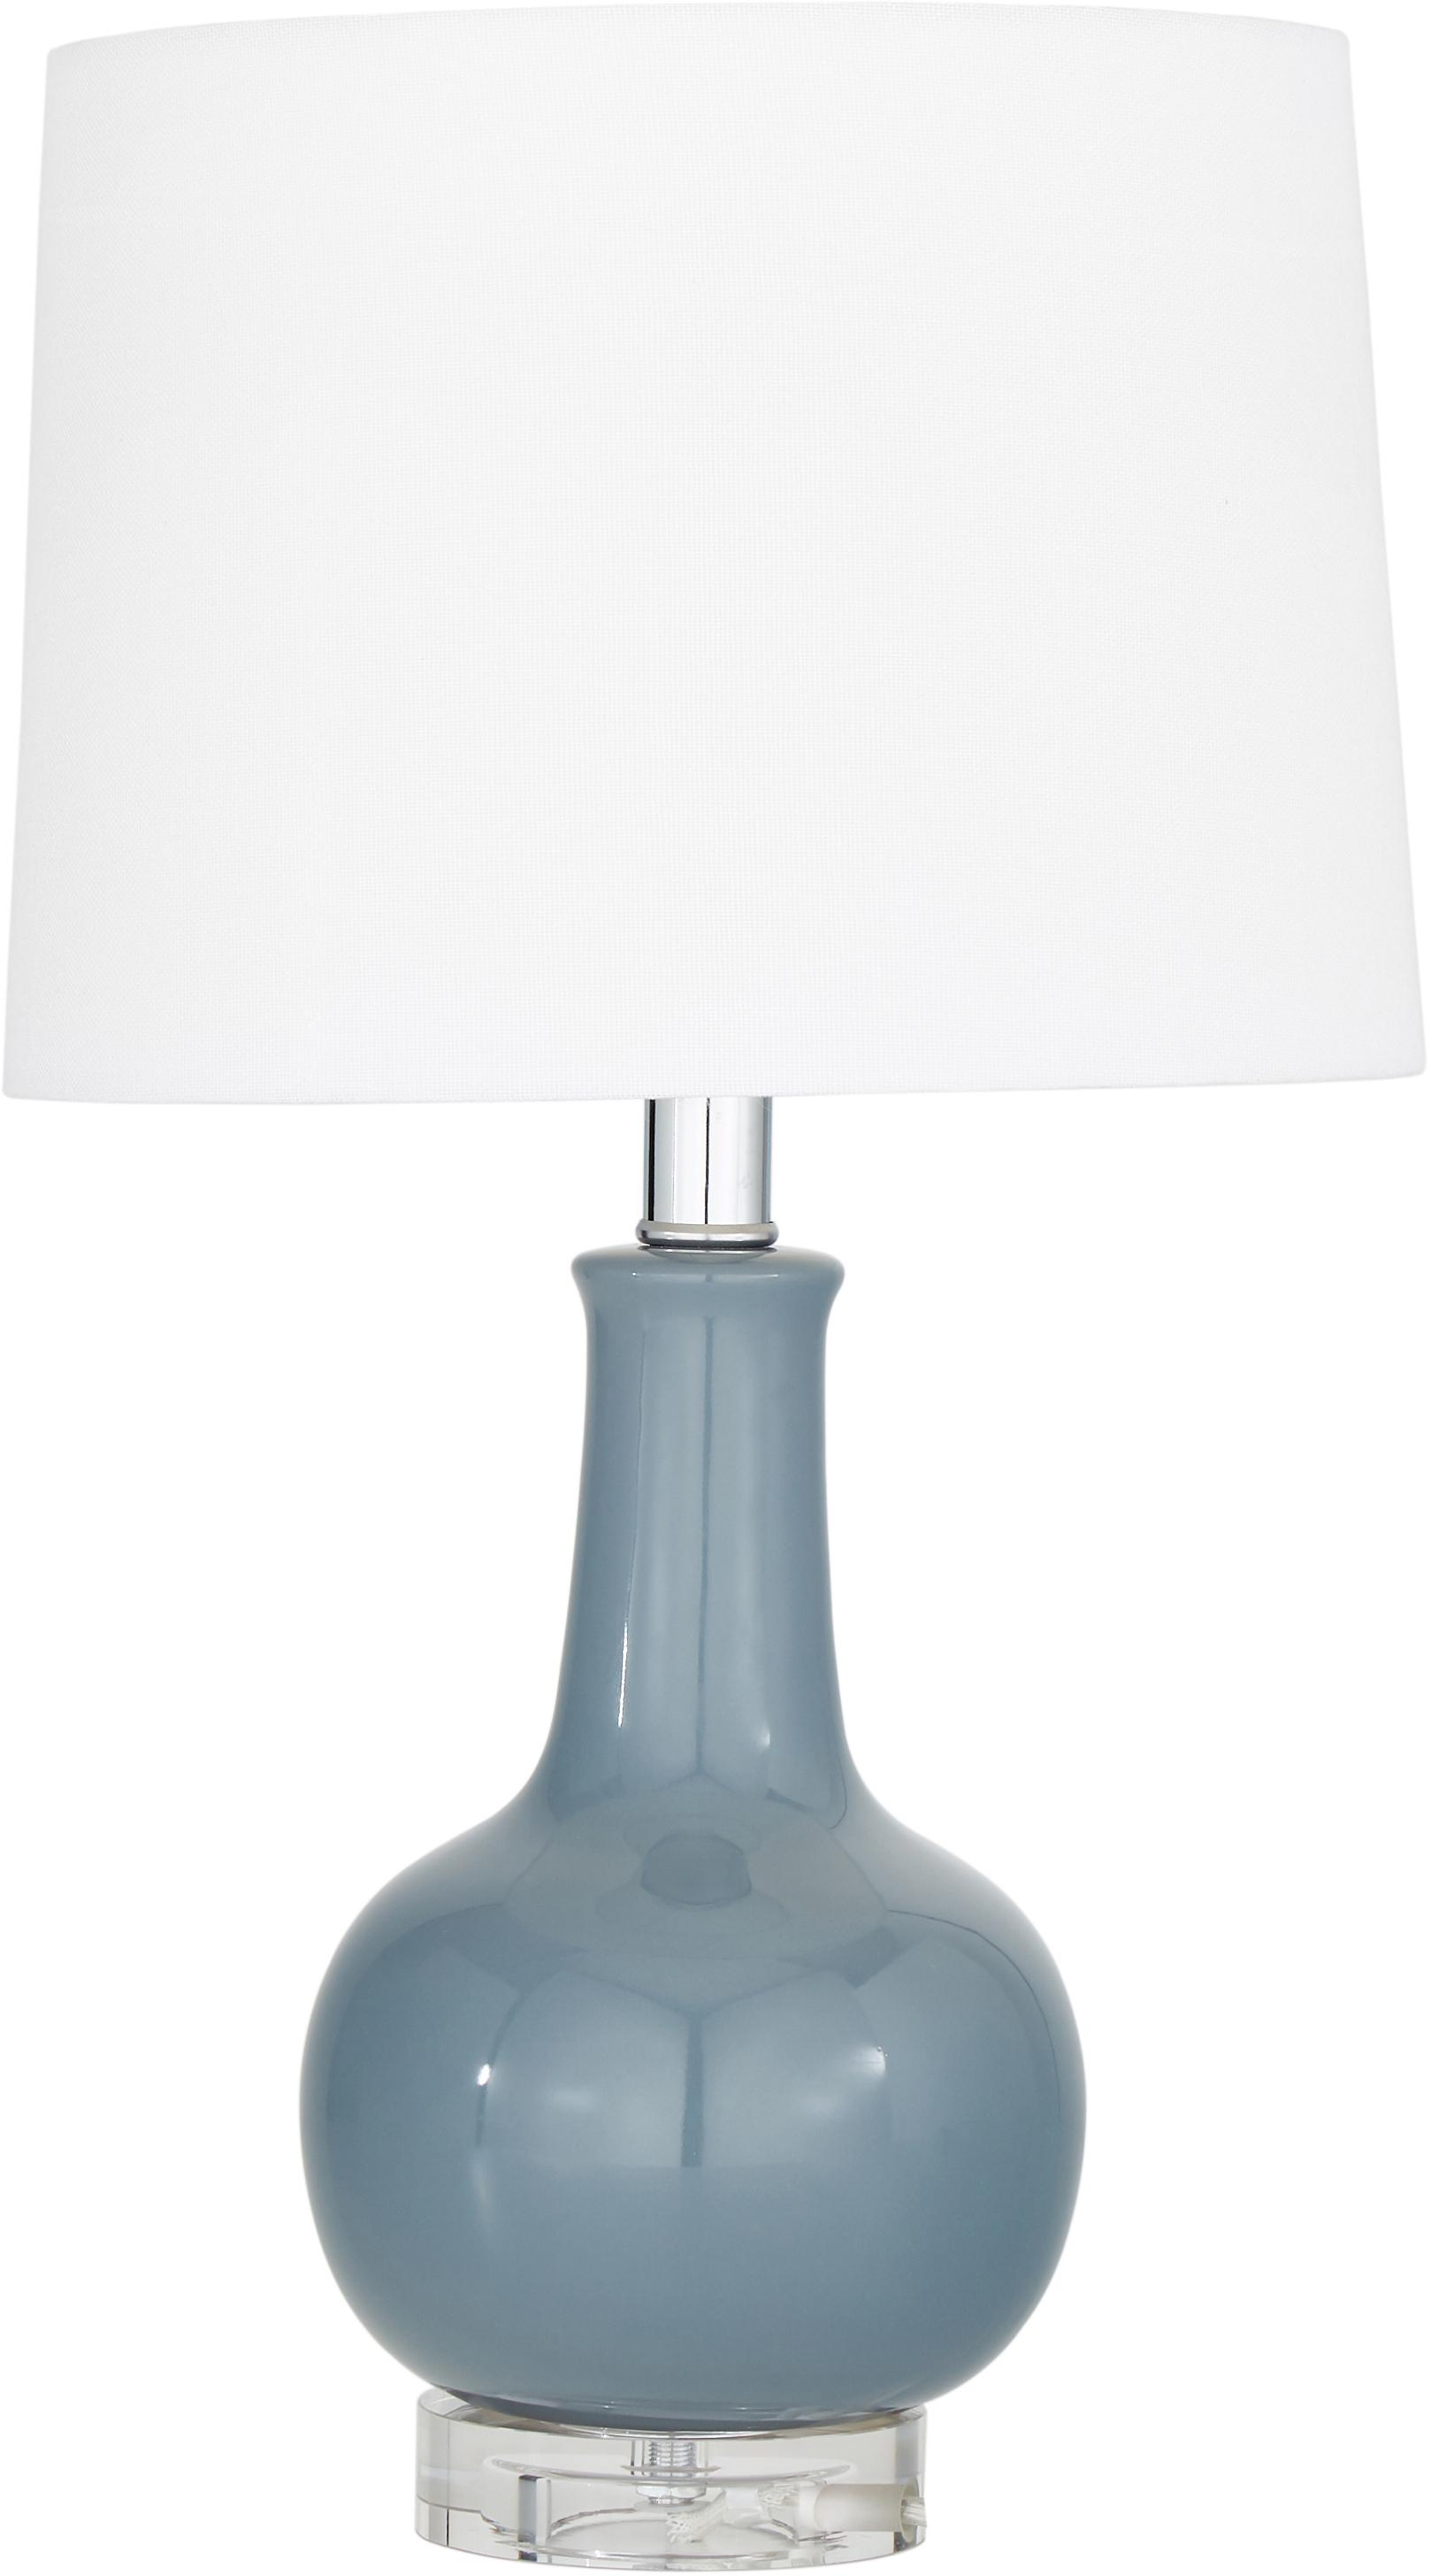 Keramik-Tischlampe Brittany, Lampenschirm: Textil, Lampenfuß: Keramik, Sockel: Kristallglas, Weiß, Grau, Ø 28 x H 48 cm